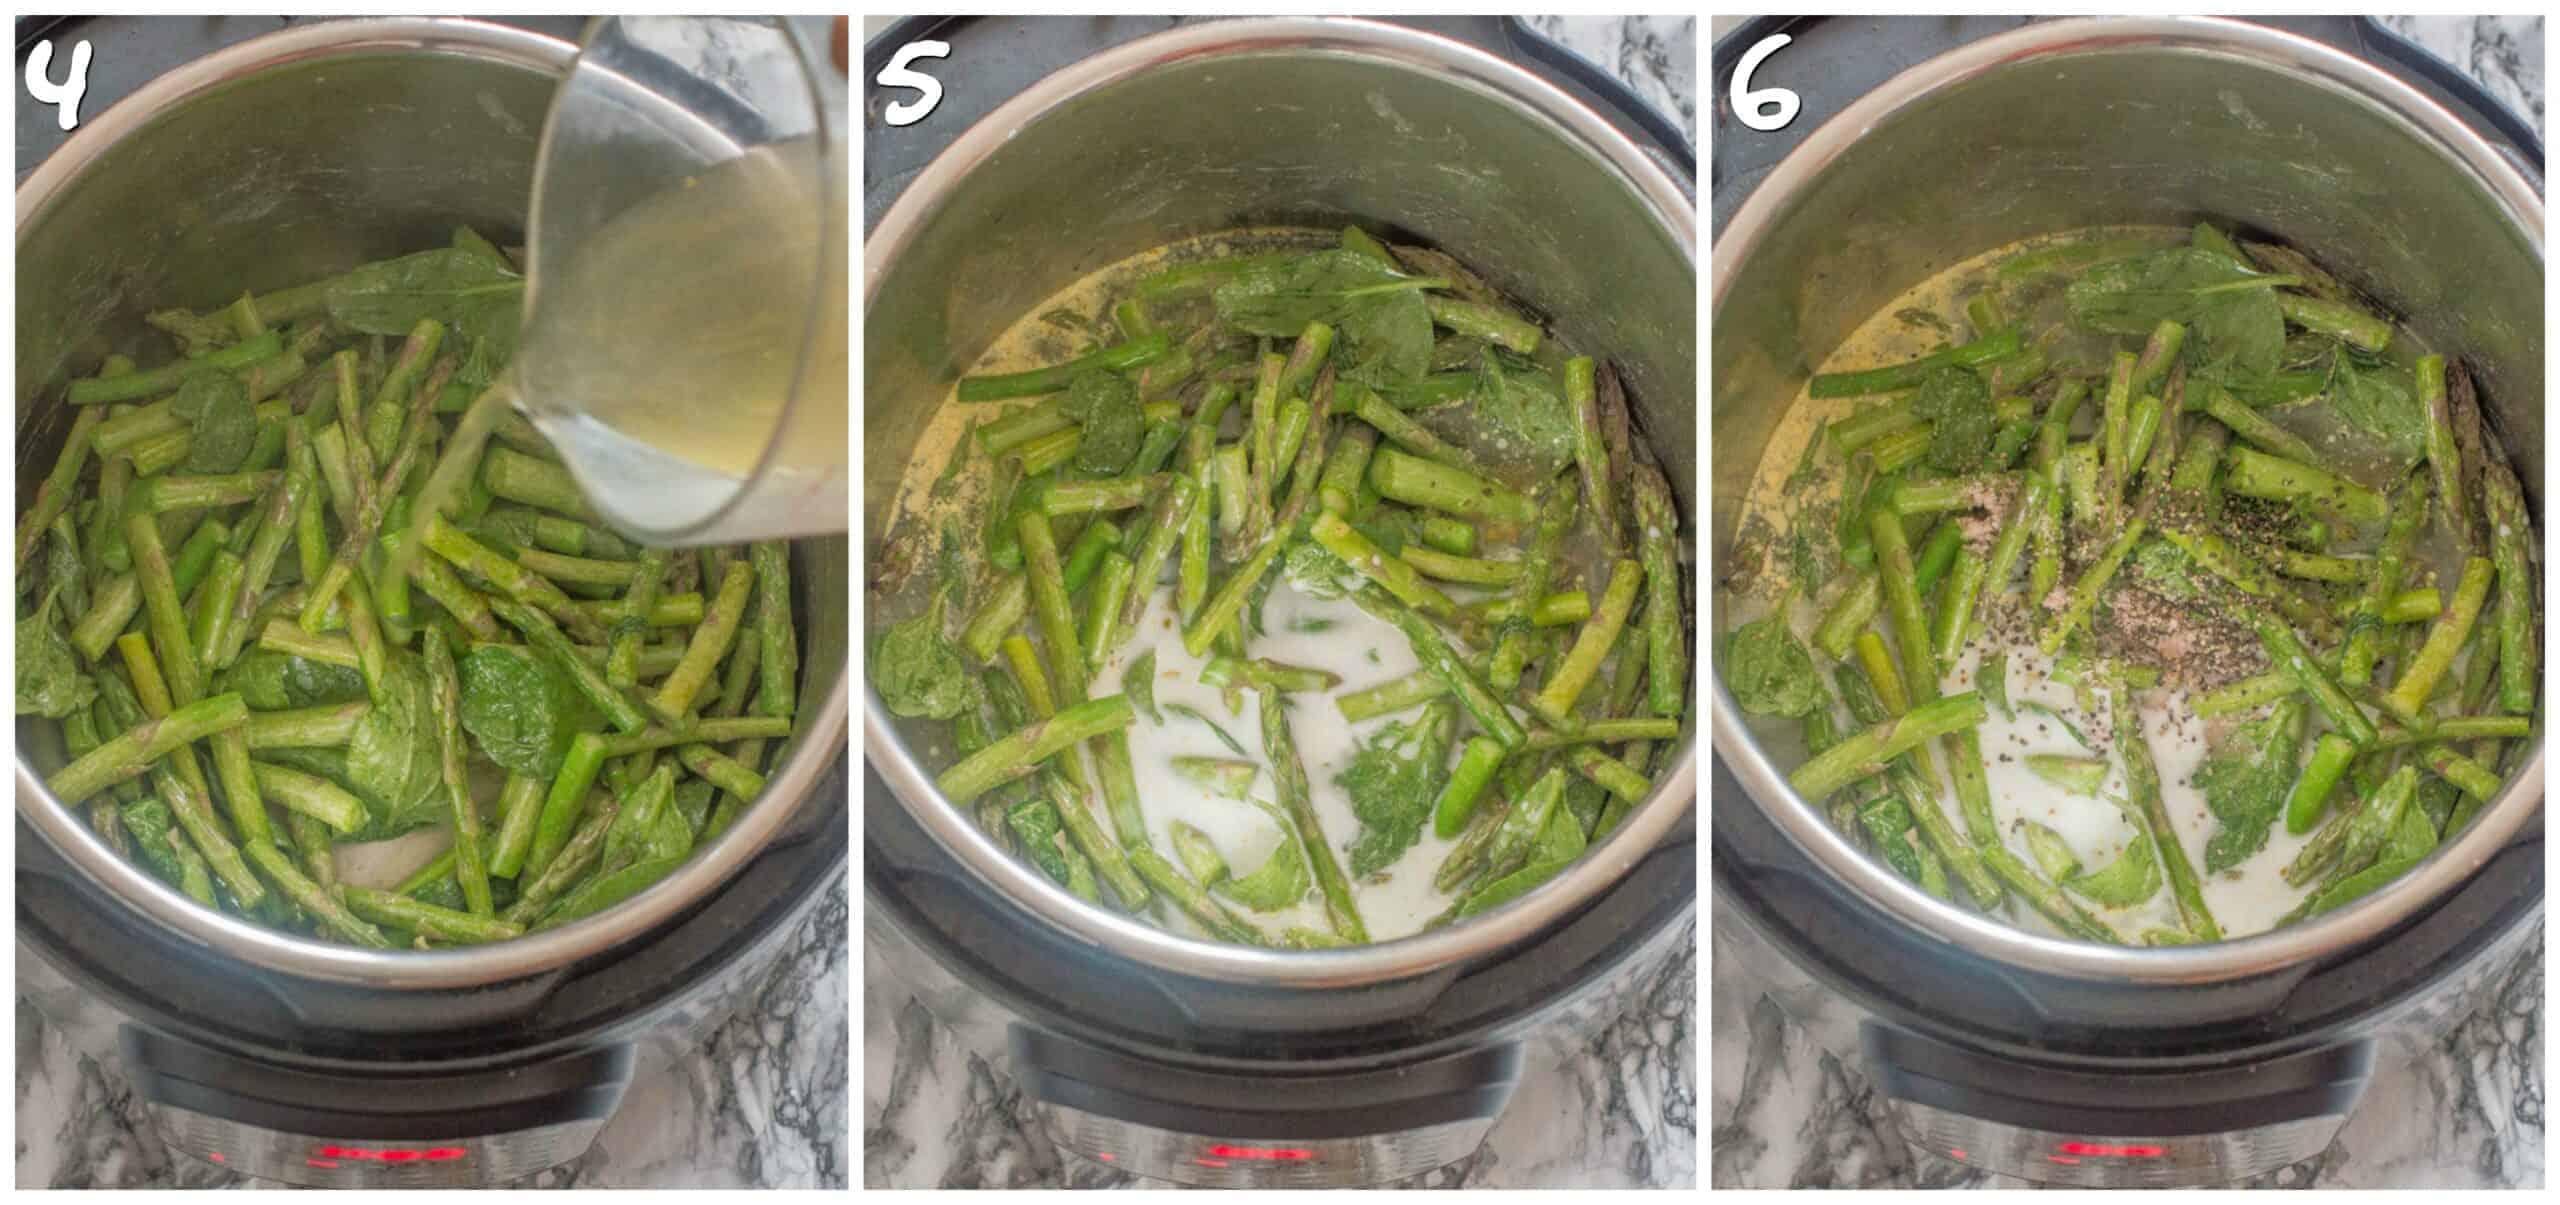 steps 4-6 adding stock, milk and seasoning